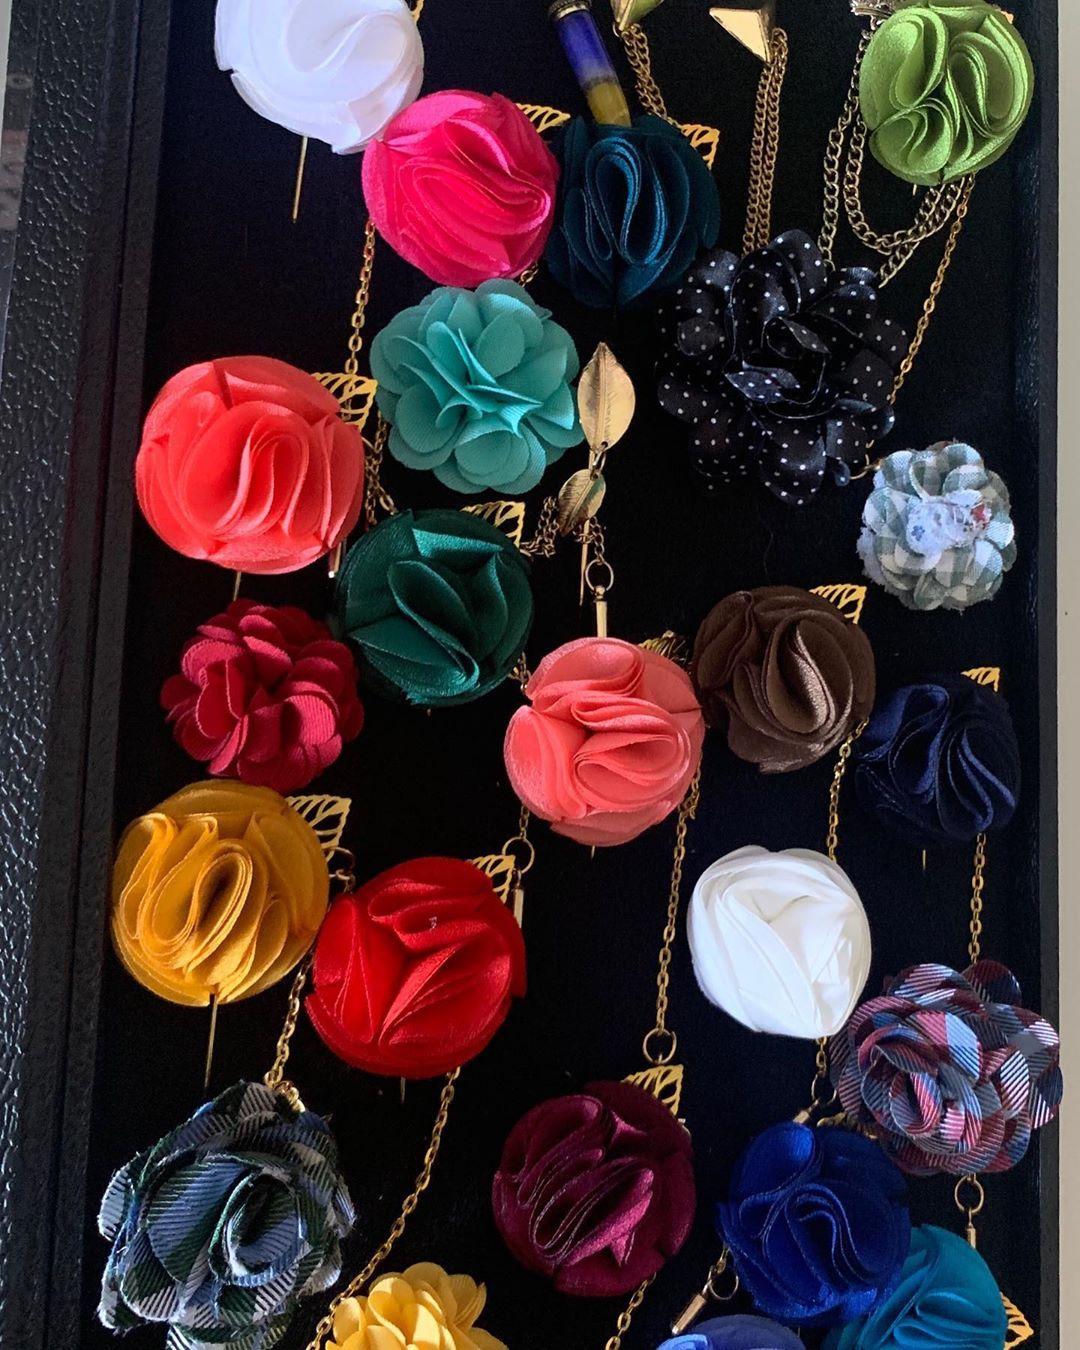 Some of my lapel pin collection.  @wearlapelpins 🌈  #lapelpins #suitandtie #suit #suitelife #lapelpi...